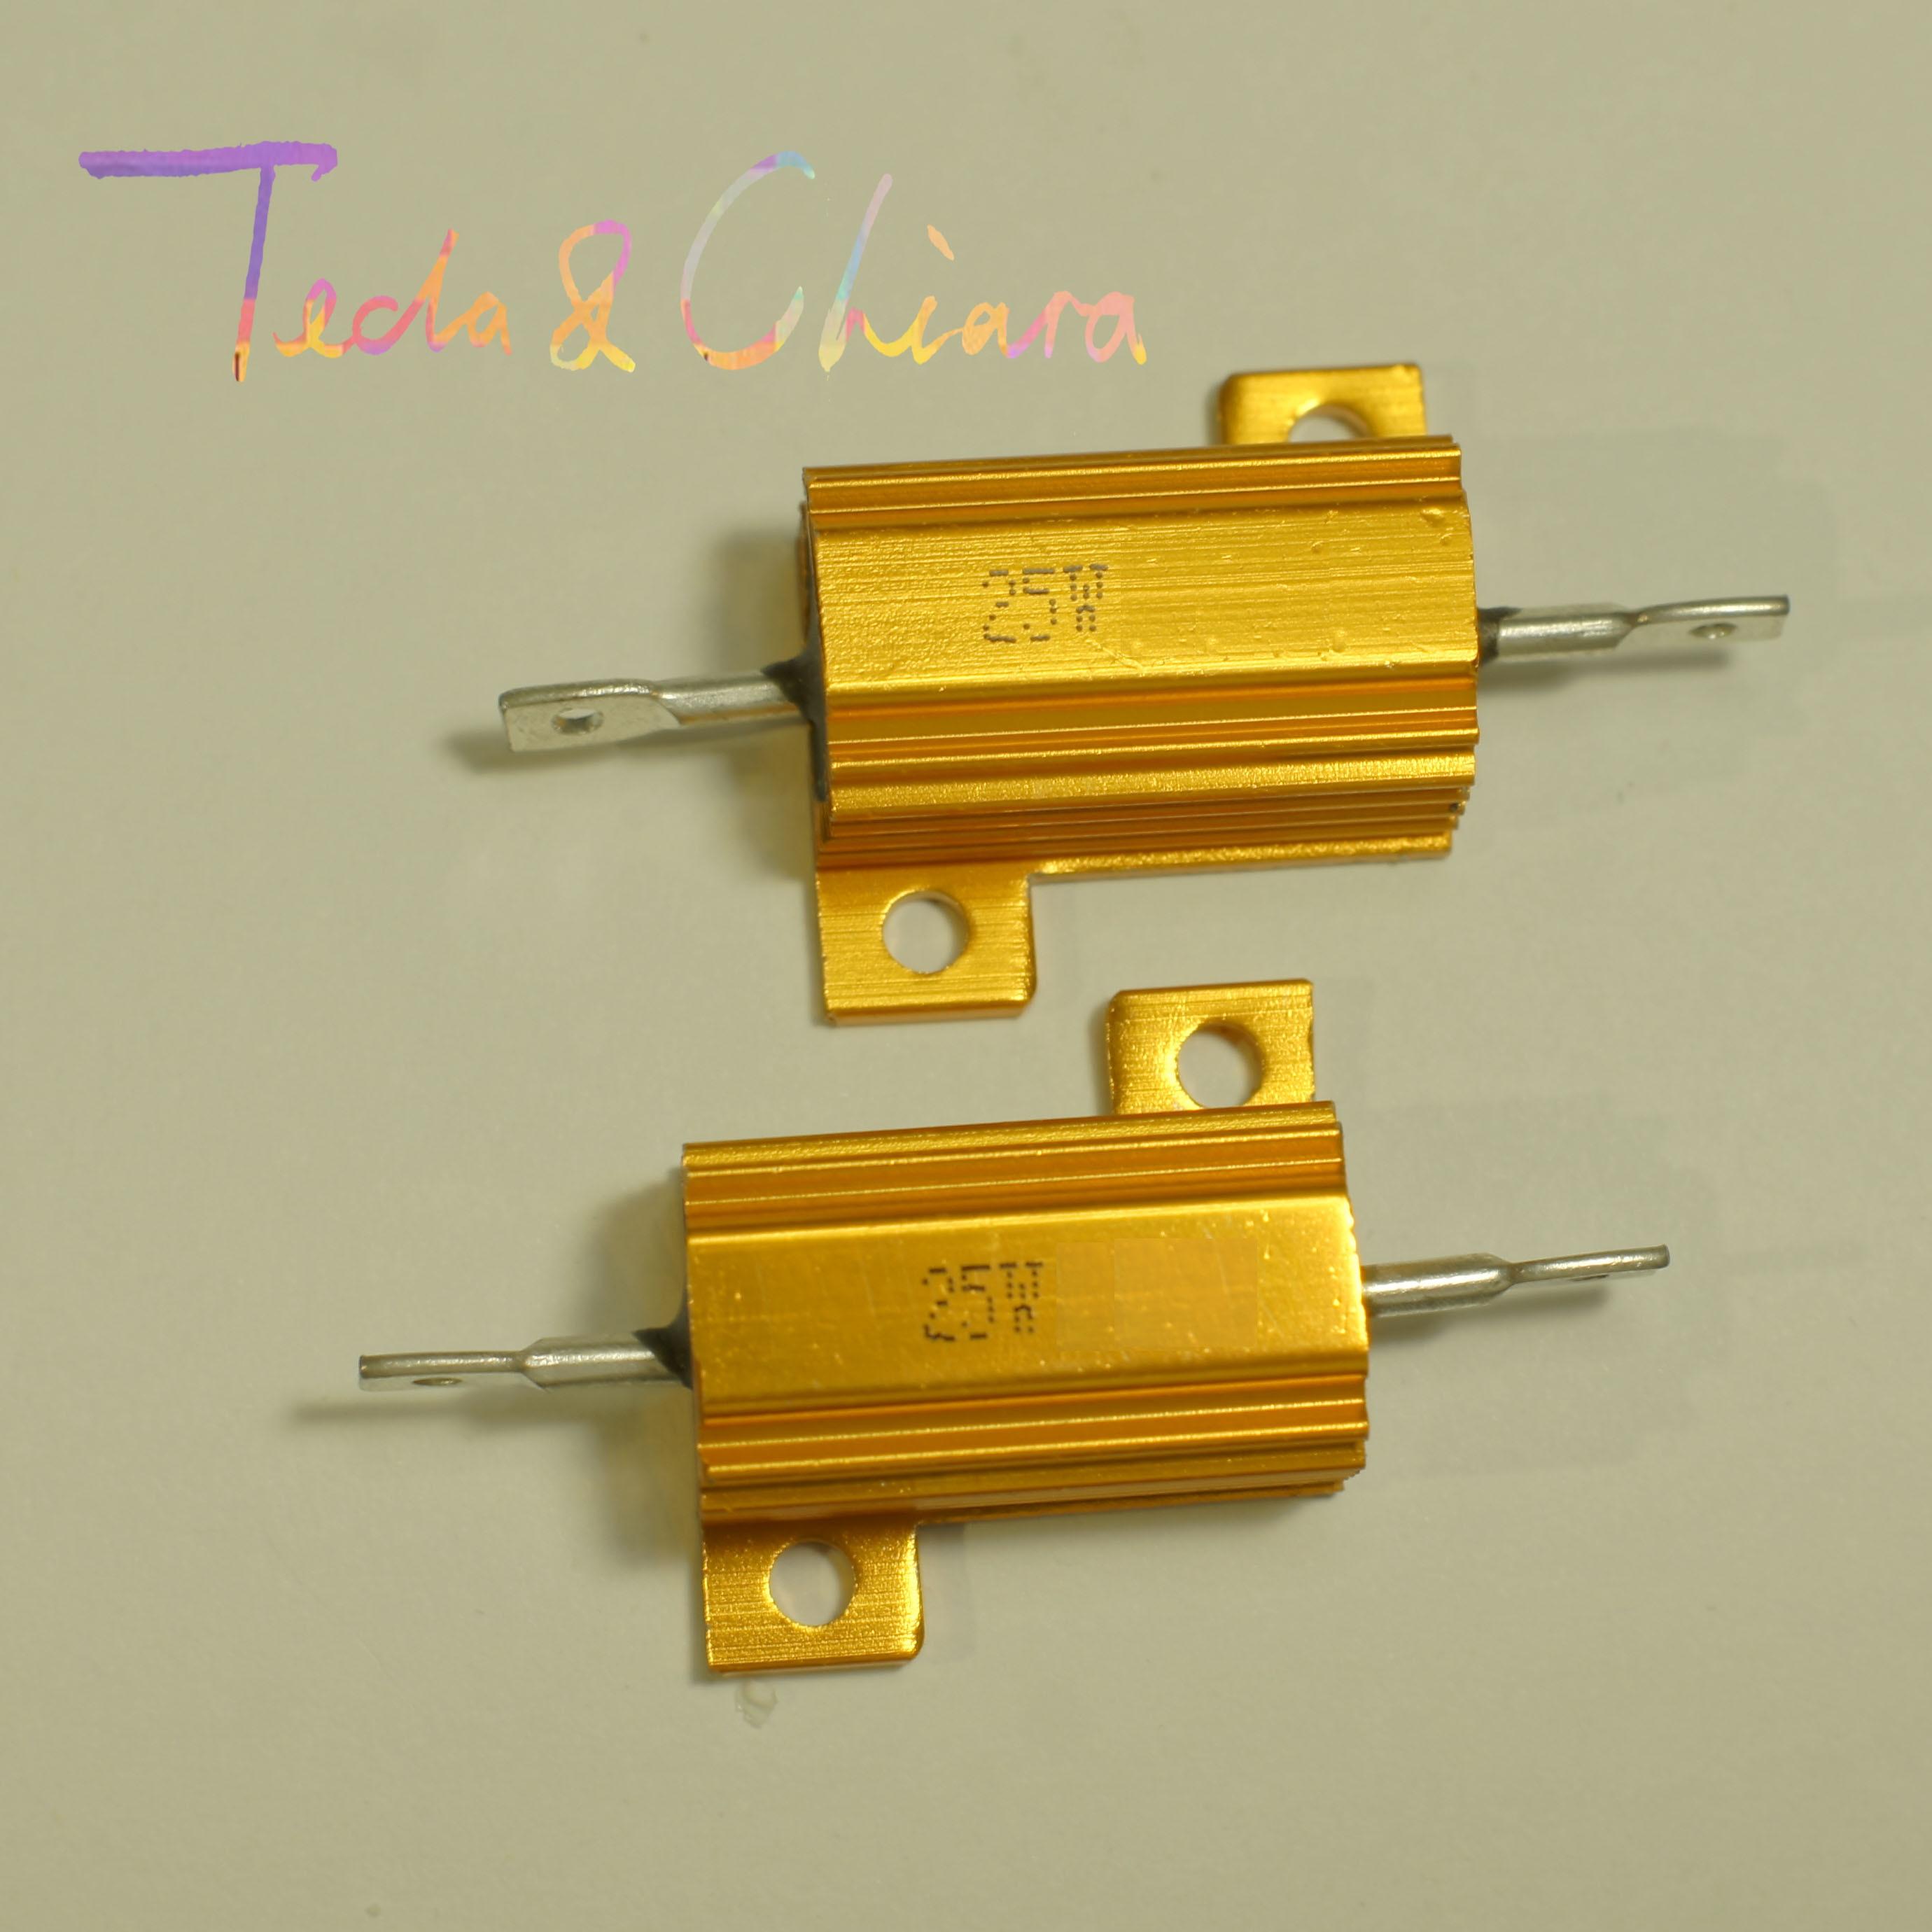 2Pcs 15R 15ohm 15 16R 16ohm 16 R Ohm 25W Watt Wirewound Aluminum Power Metal Shell Case Resistance Resistor RX24